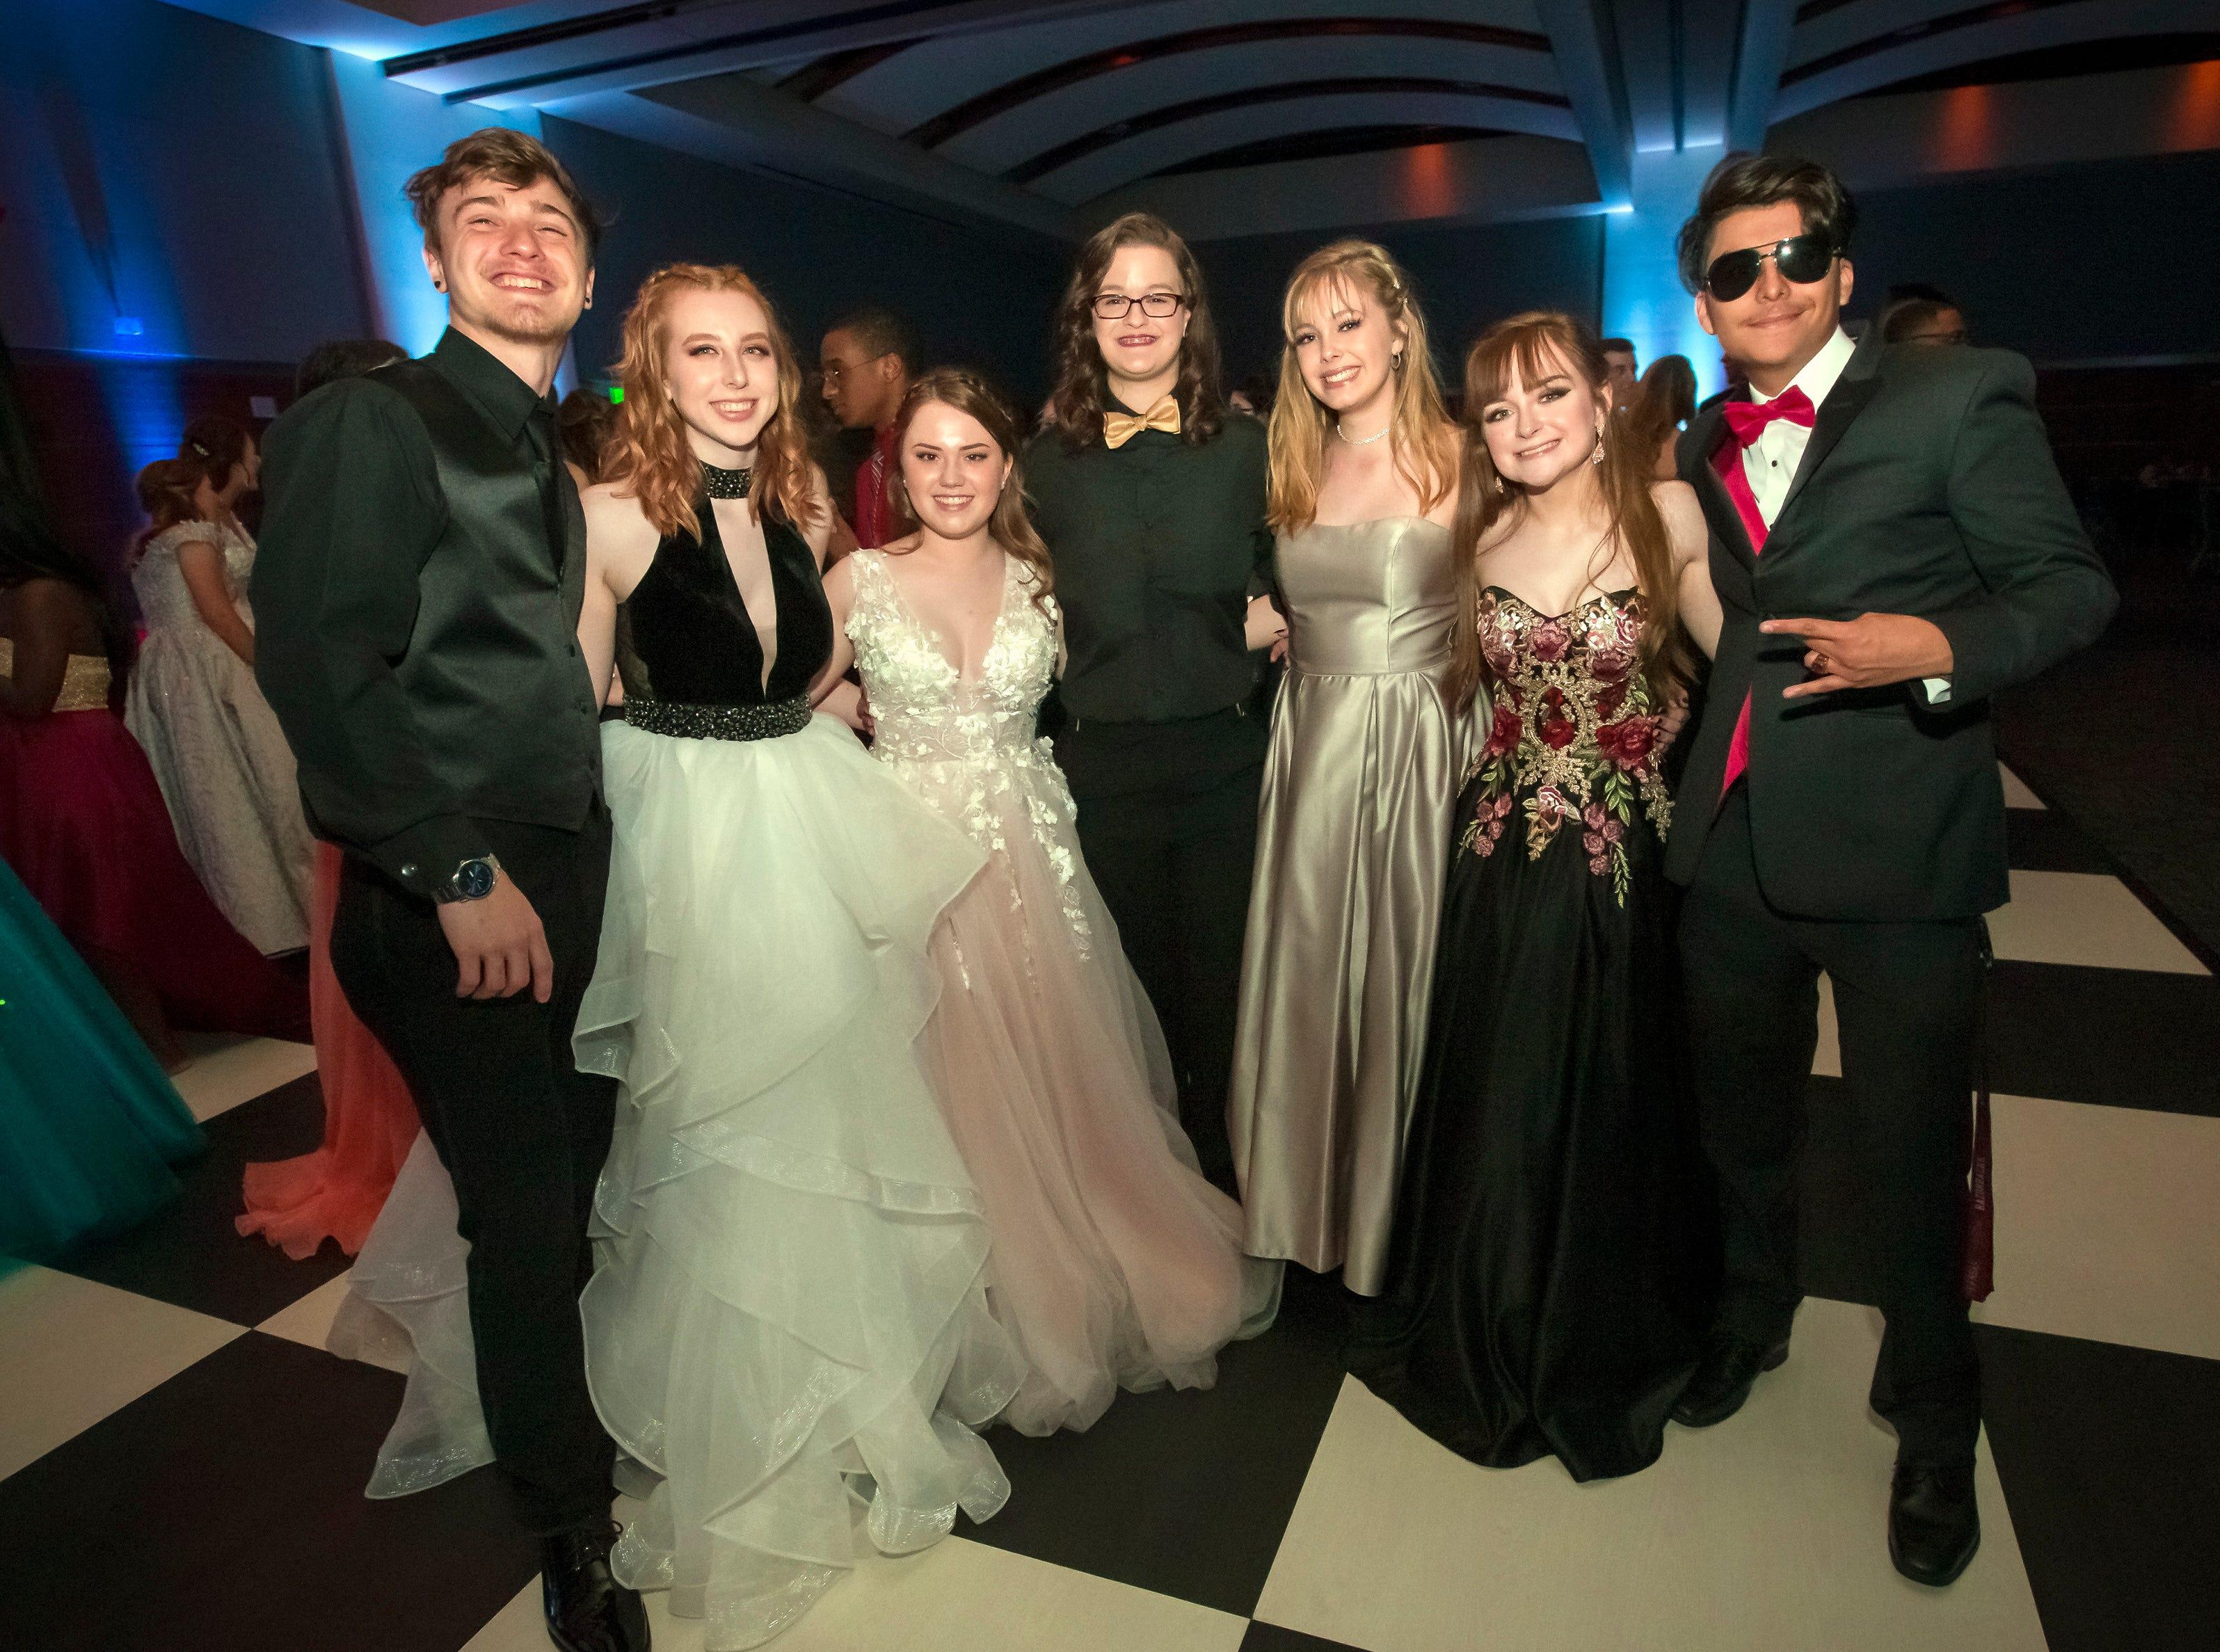 Stewarts Creek High School prom held at MTSU, Friday, April 5, 2019.JIM DAVIS/for the DNJ